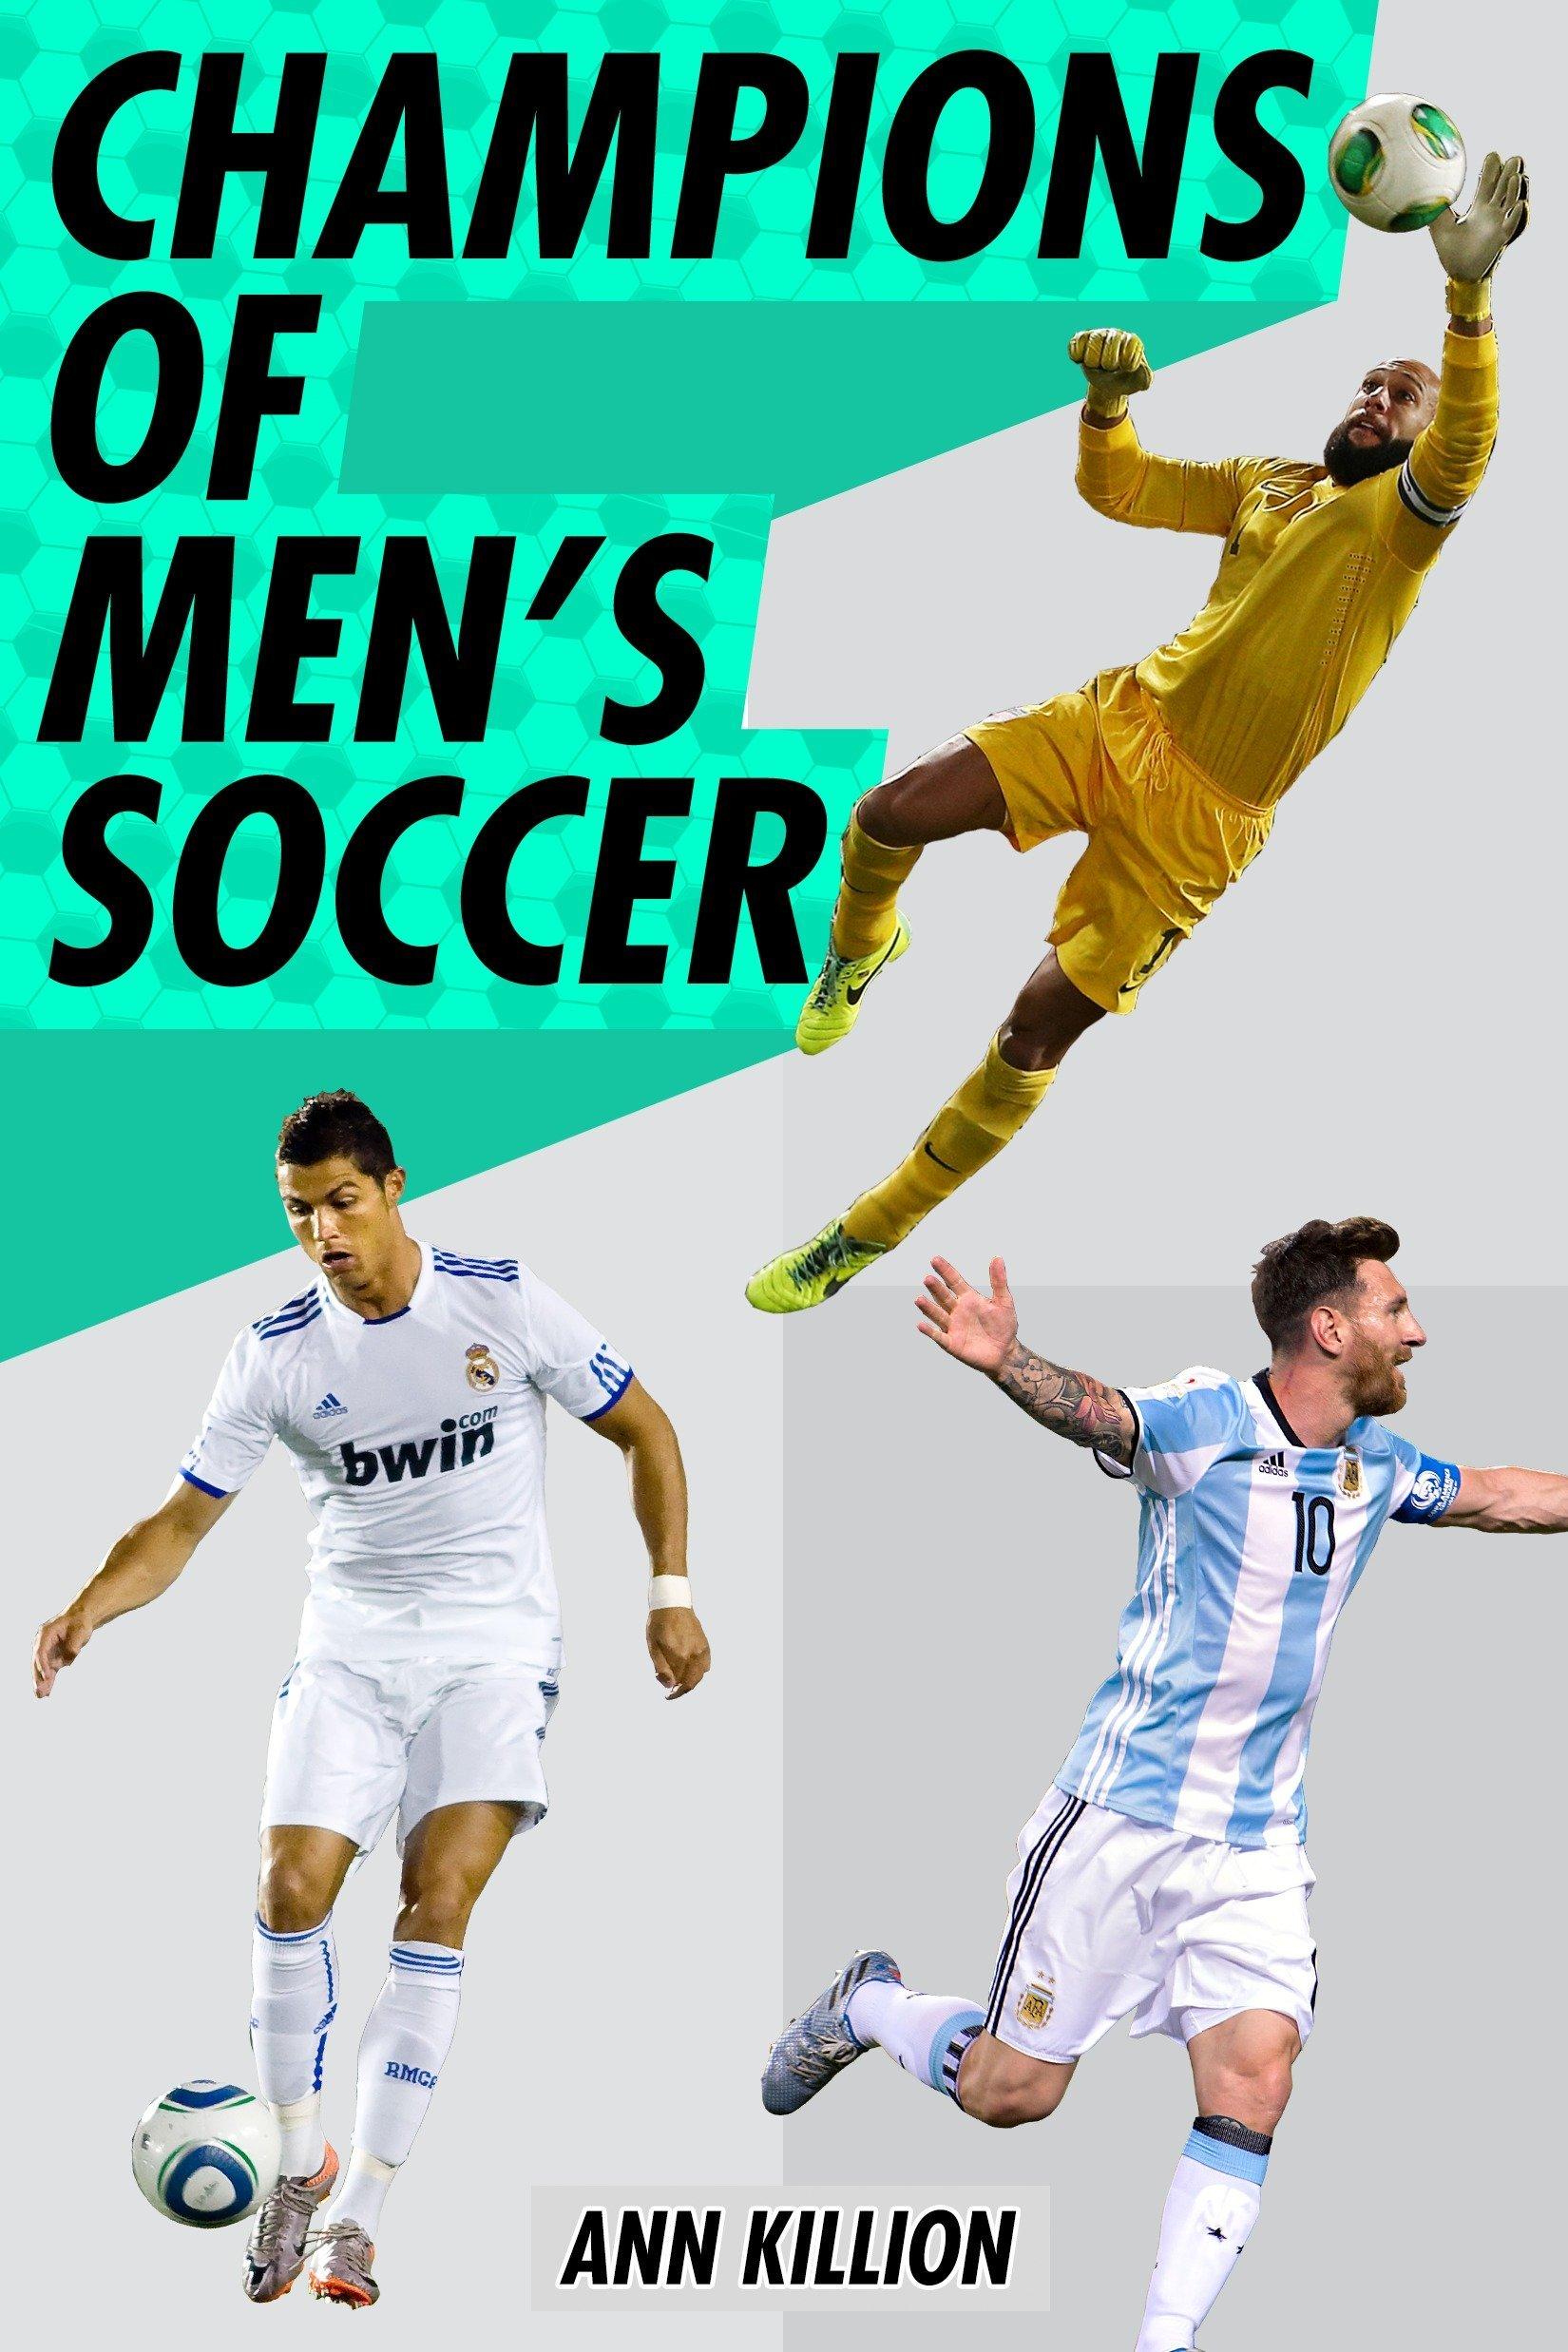 Champions of Men's Soccer ebook